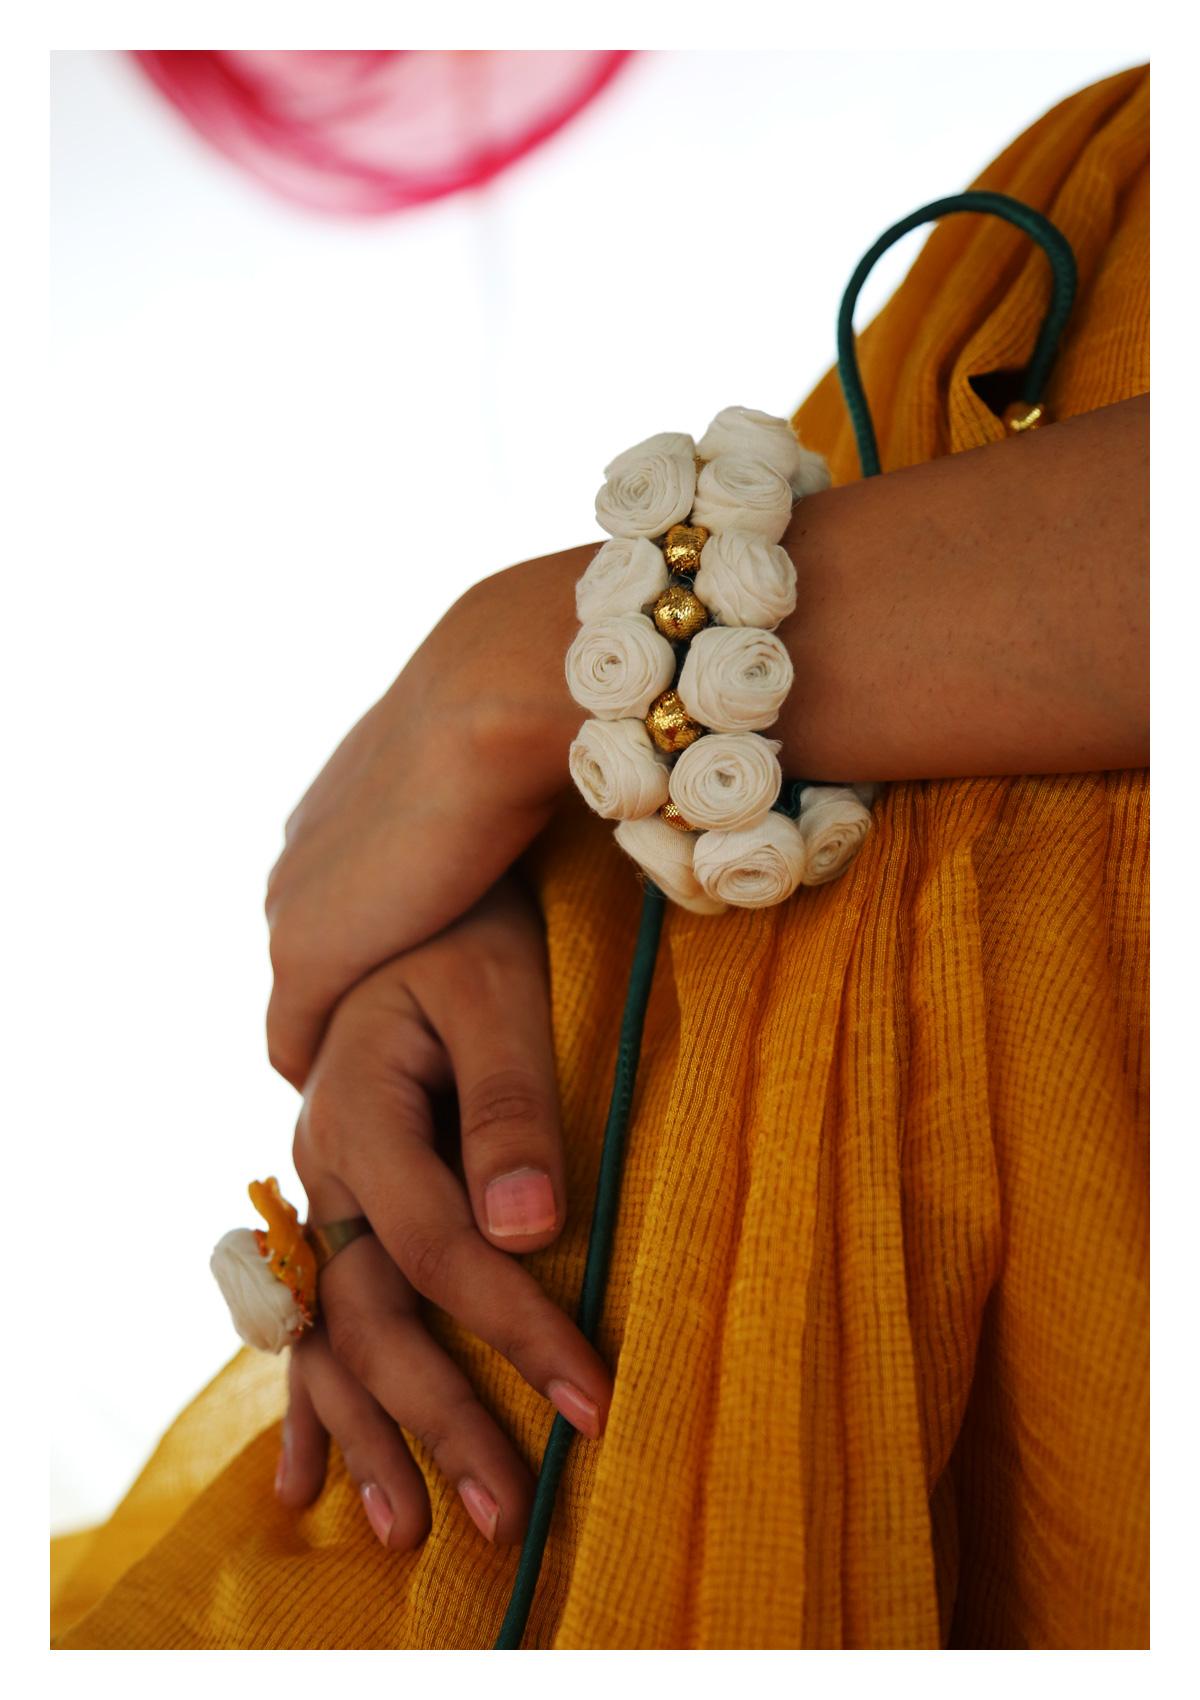 Hu White Rose Textile Accessory